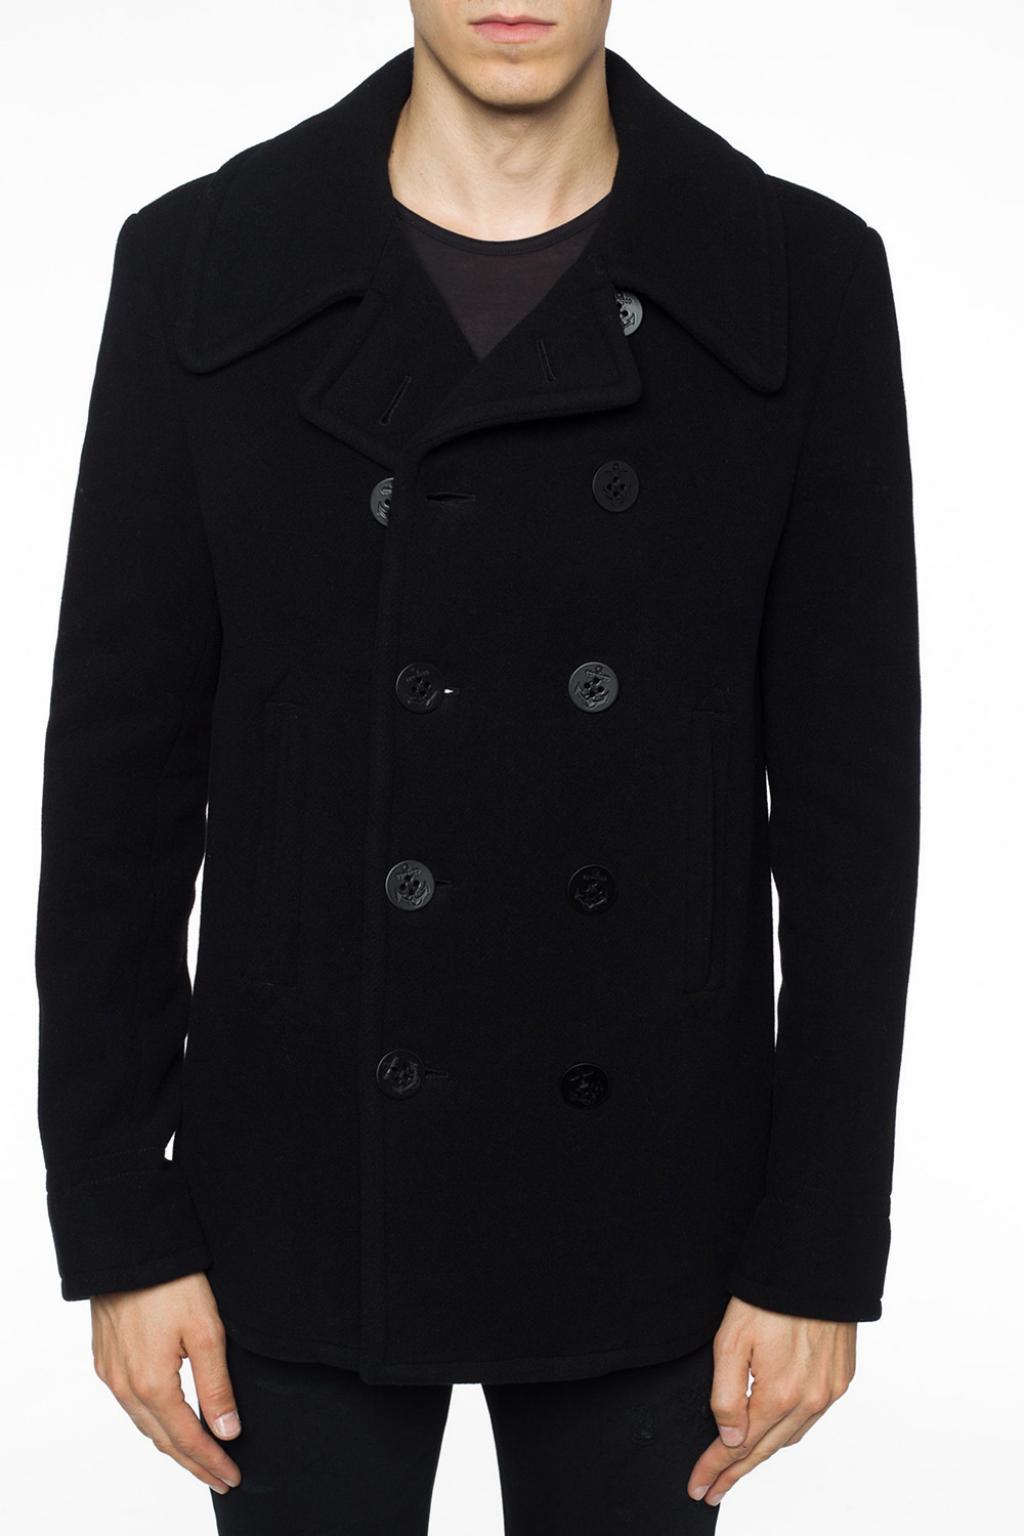 1ddaf9e2ae127 Margiela For Lyst Breasted Maison Men Black In Double Jacket PwwHgSq